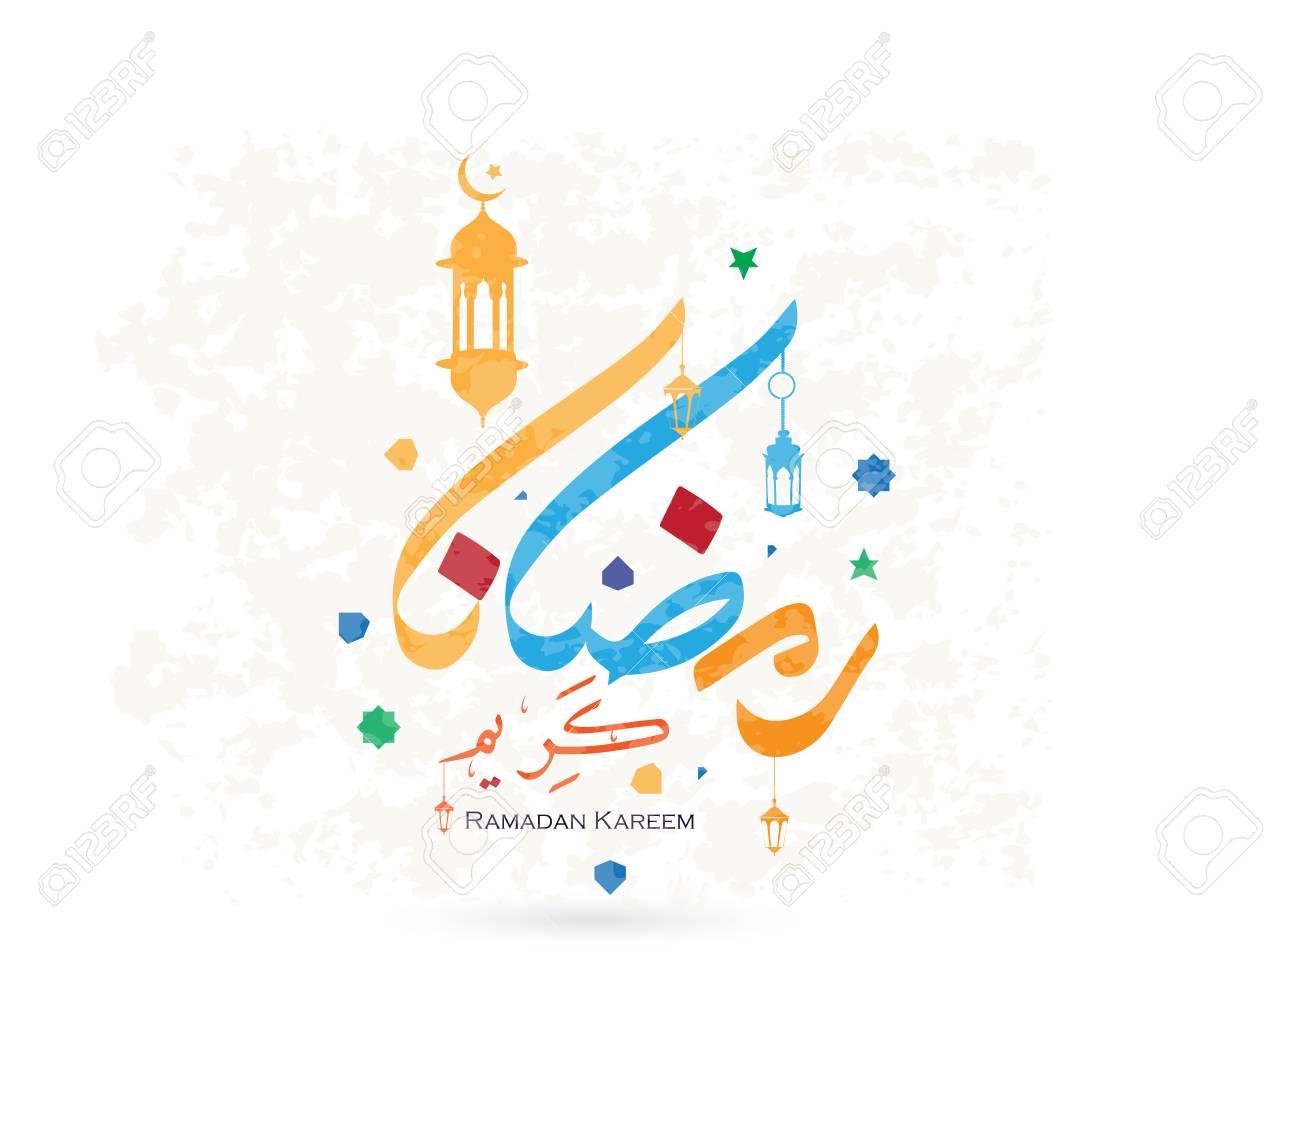 Ramadan kareem greeting cards in arabic style calligraphy in ramadan kareem greeting cards in arabic style calligraphy in white background stock vector 100373796 m4hsunfo